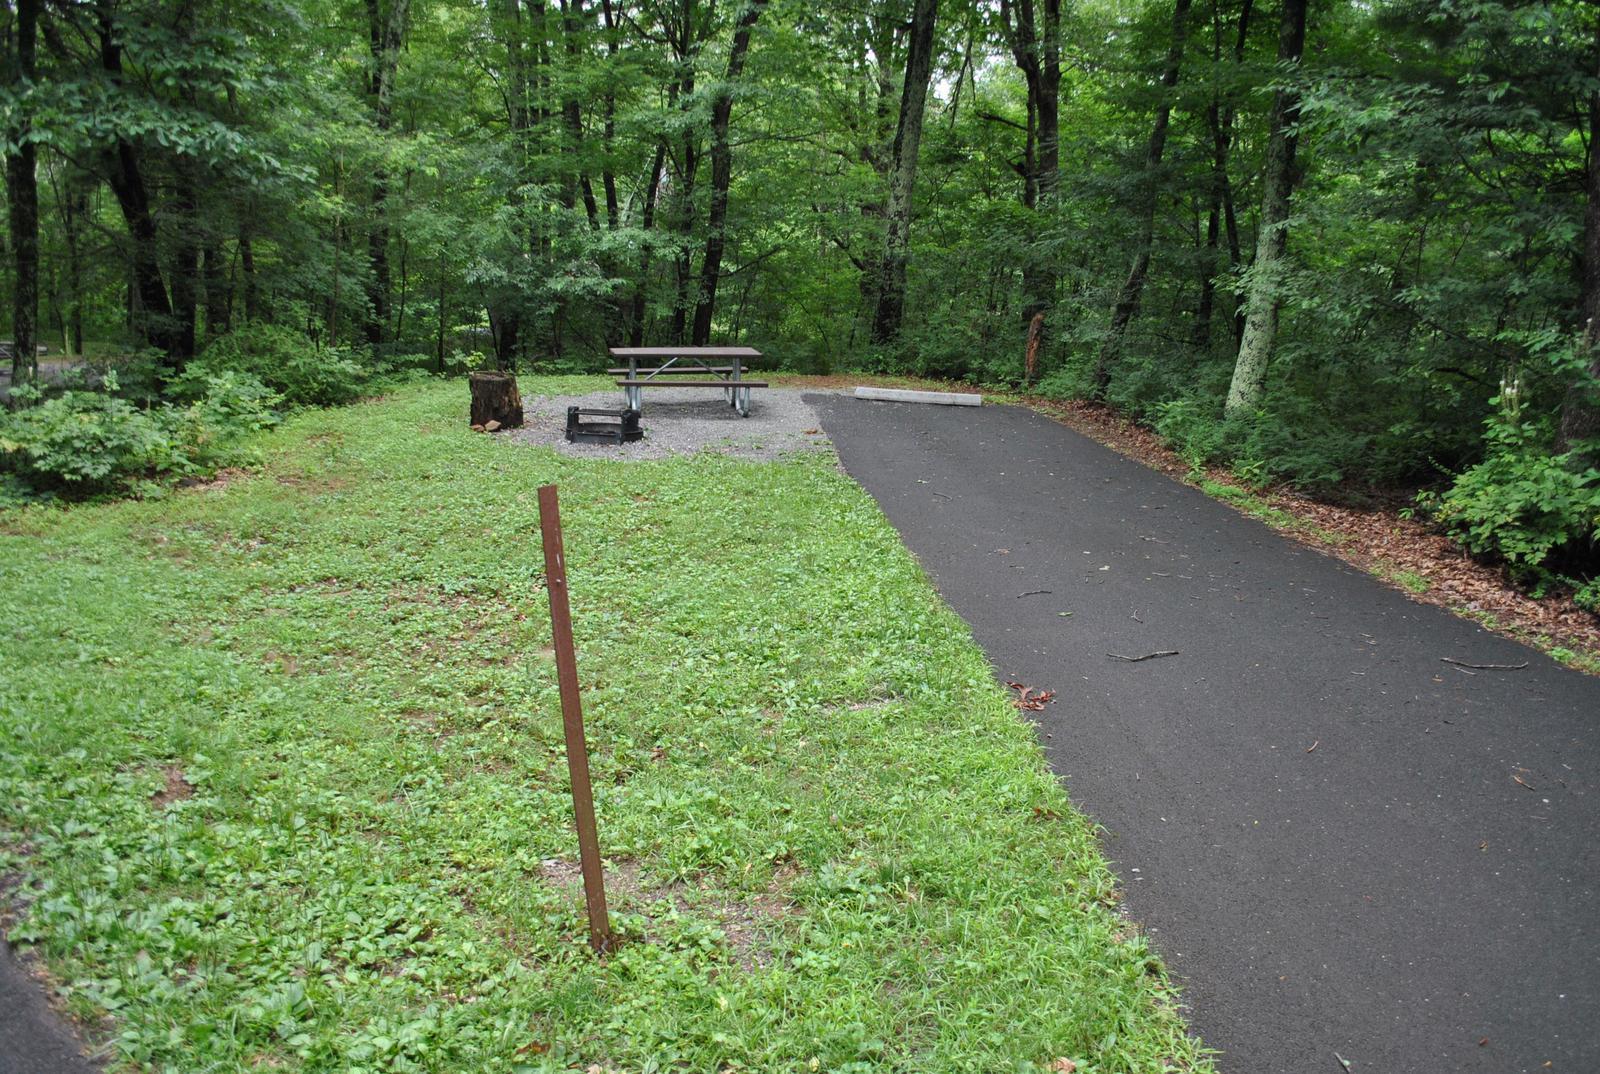 Mathews Arm Campground – Site A010